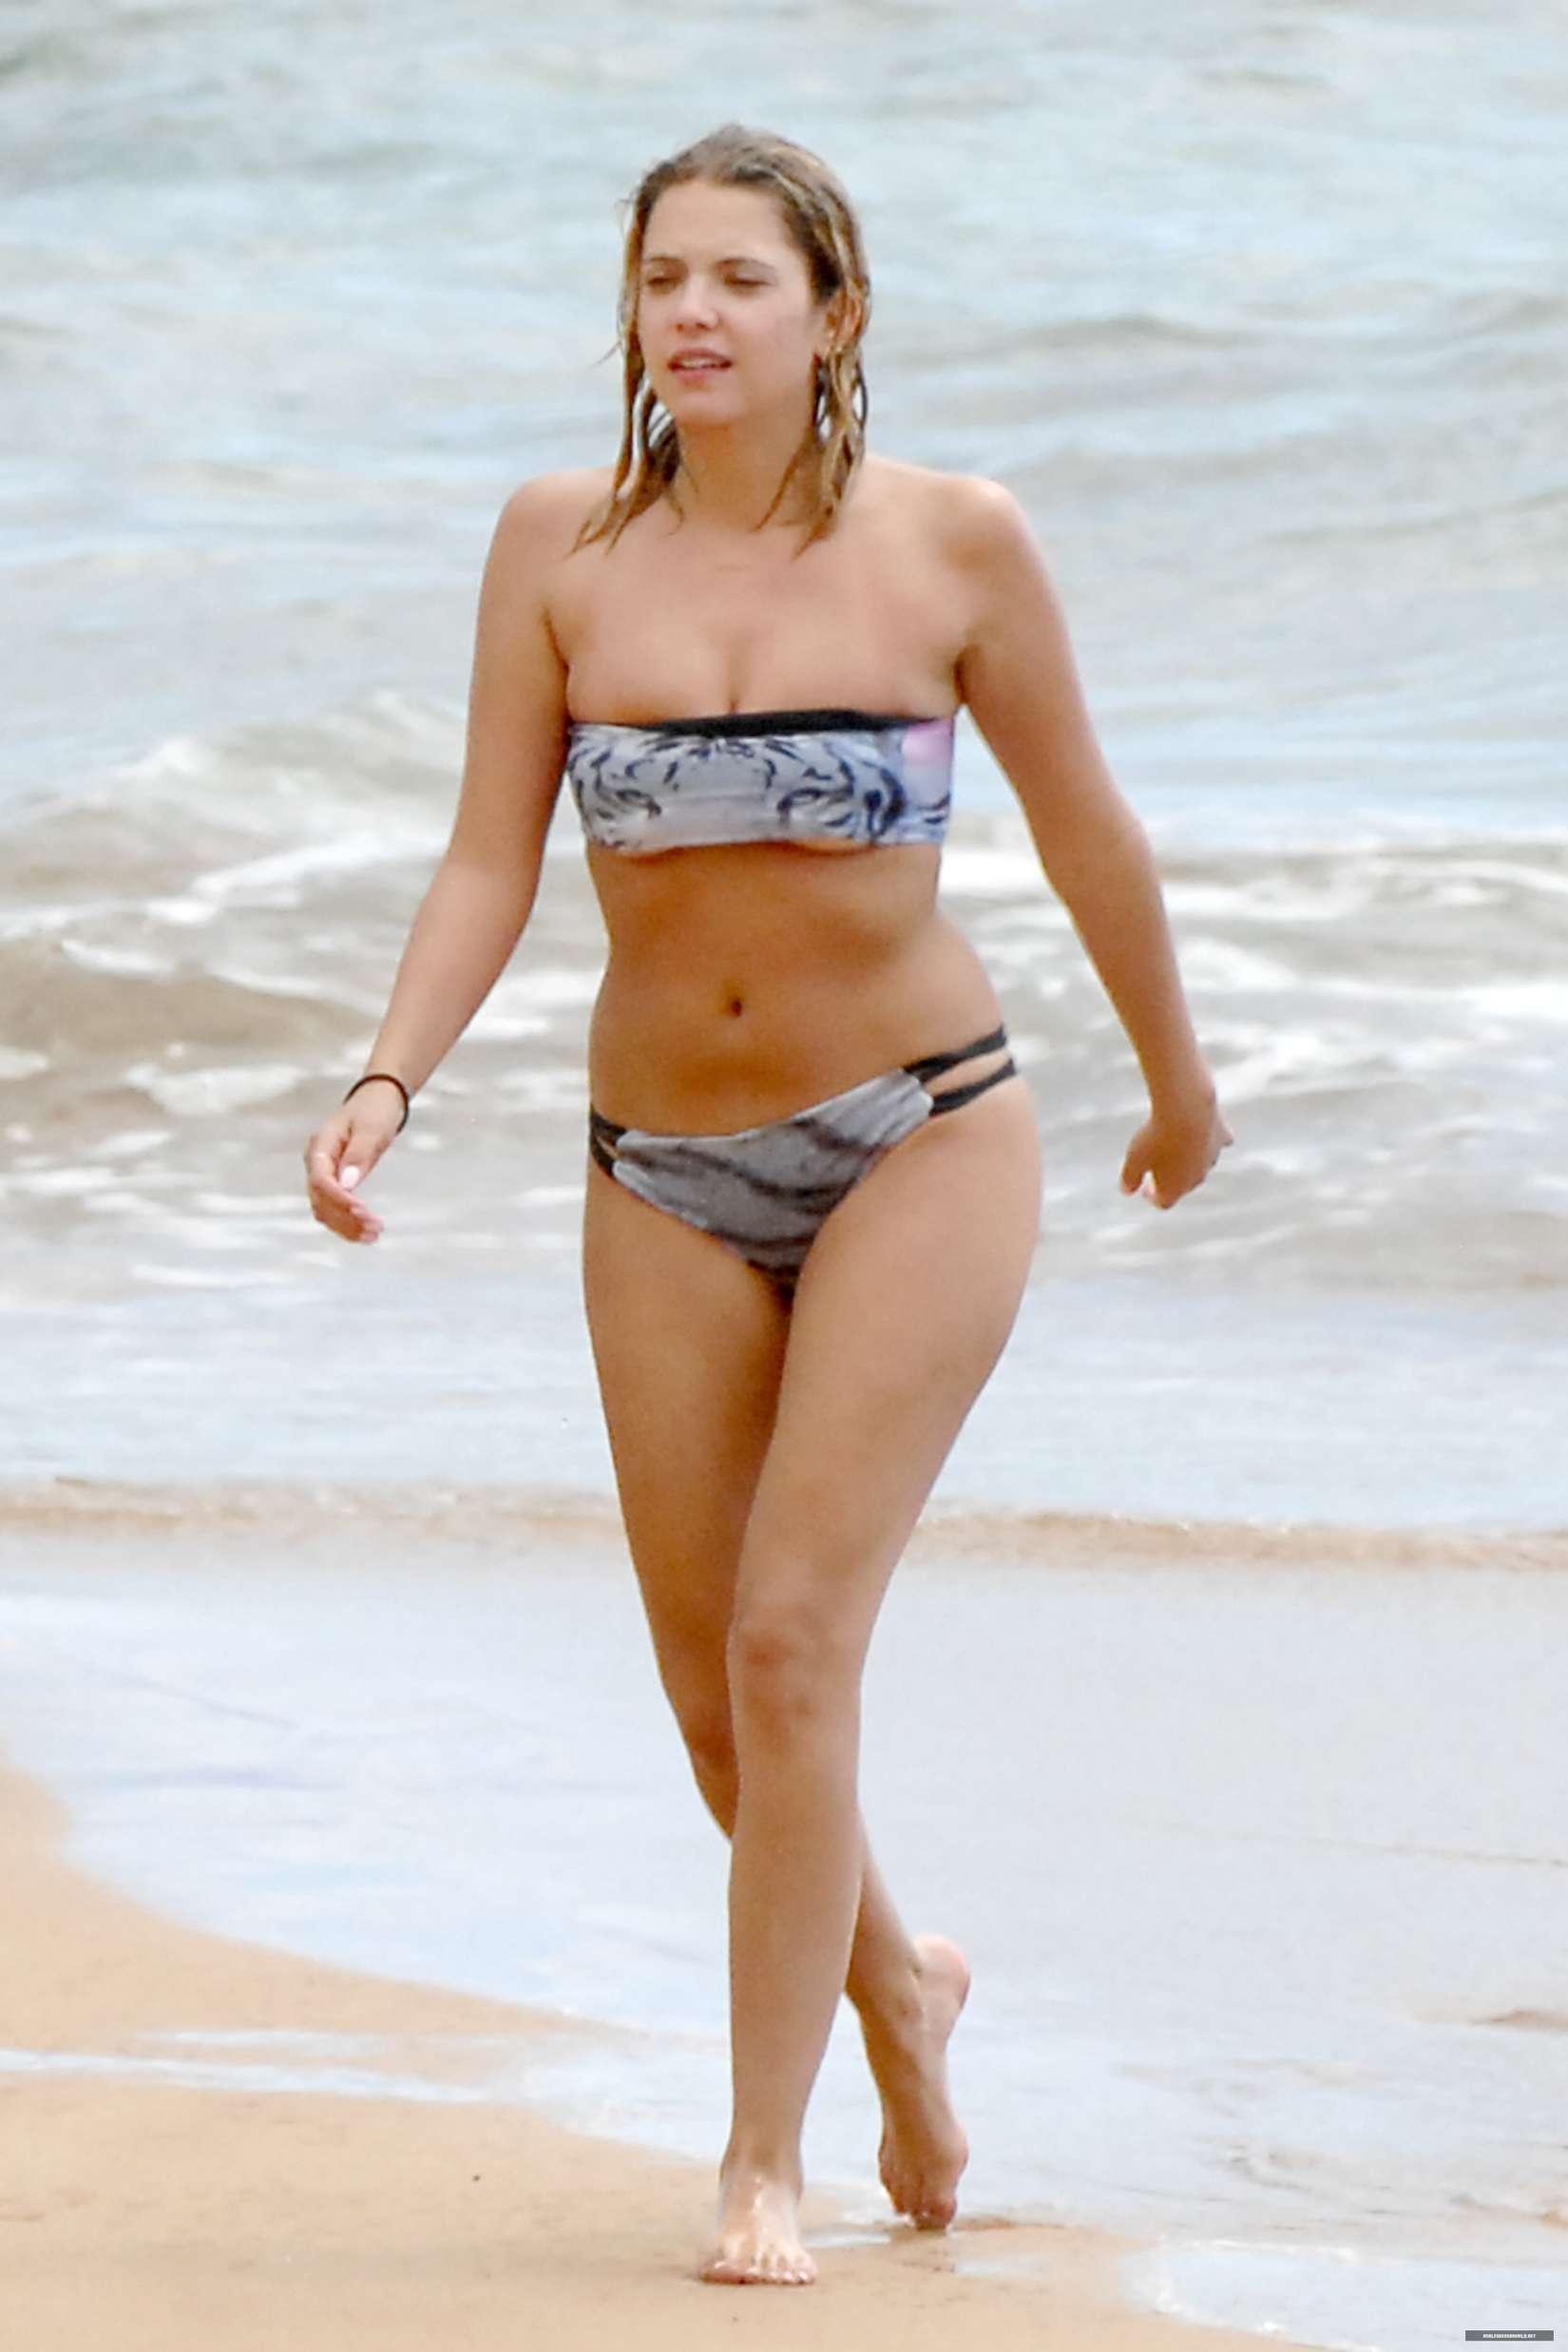 Ashley Benson Bikini Bodies Pic 10 of 35